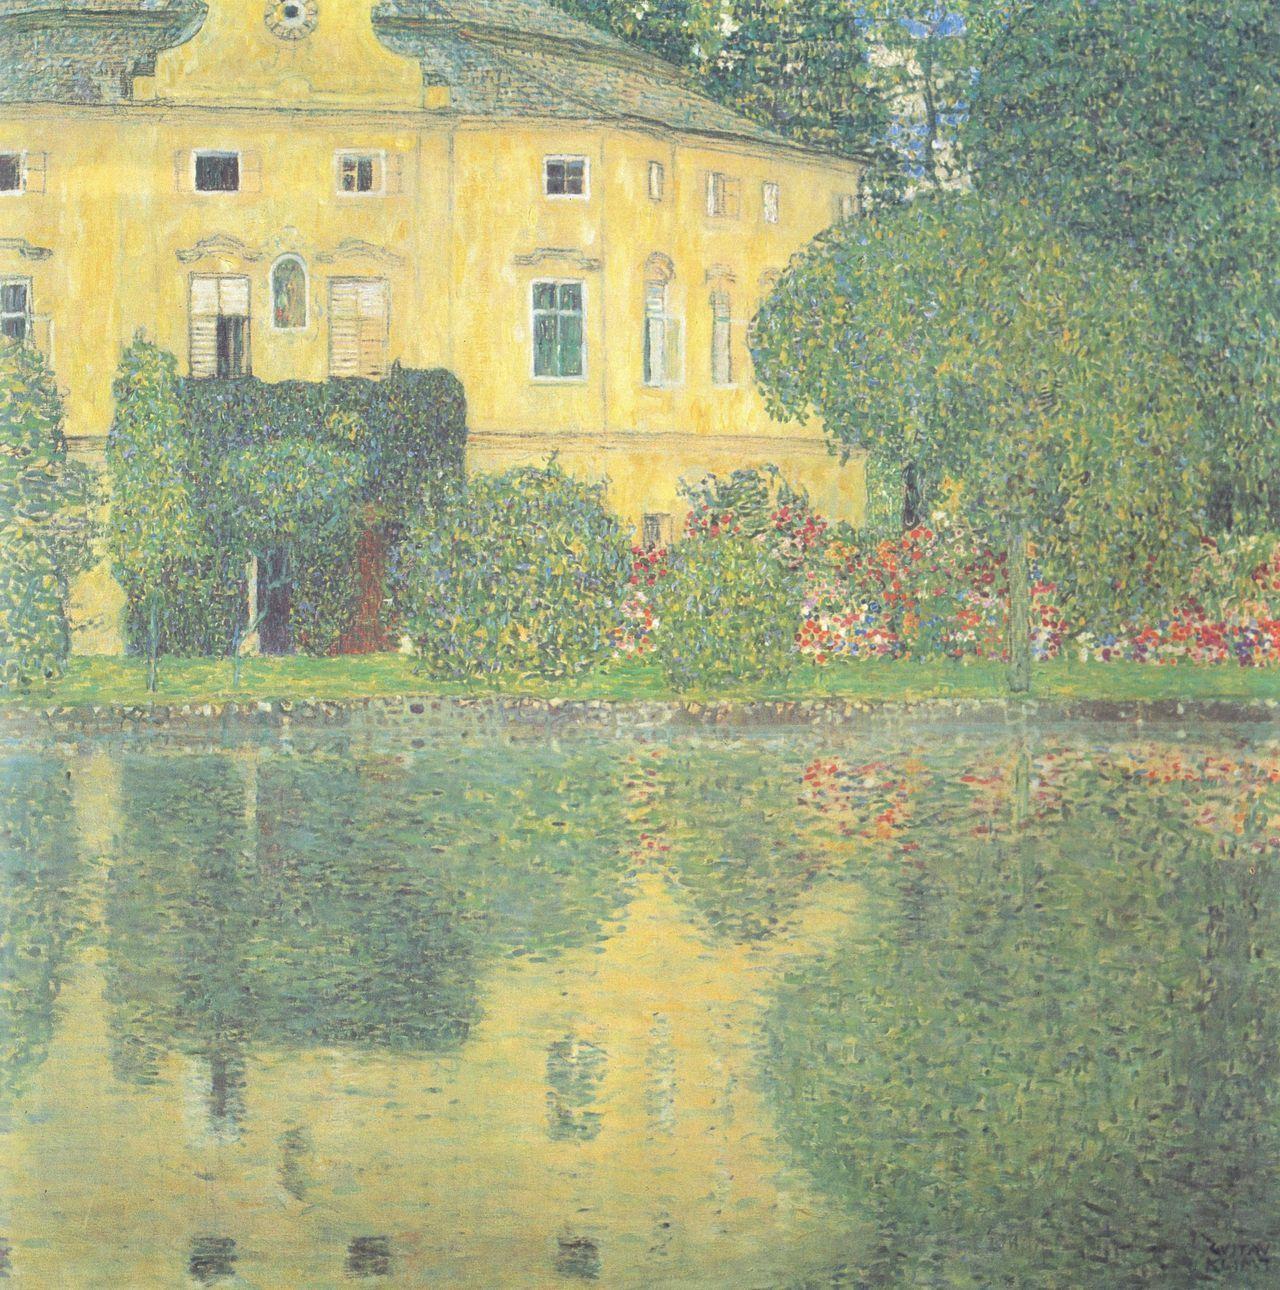 Schloss Kammer On The Attersee Iv 1910 Gustav Klimt Size 110x110 Cm Medium Oil On Canvas Gustav Klimt Klimt Art Klimt